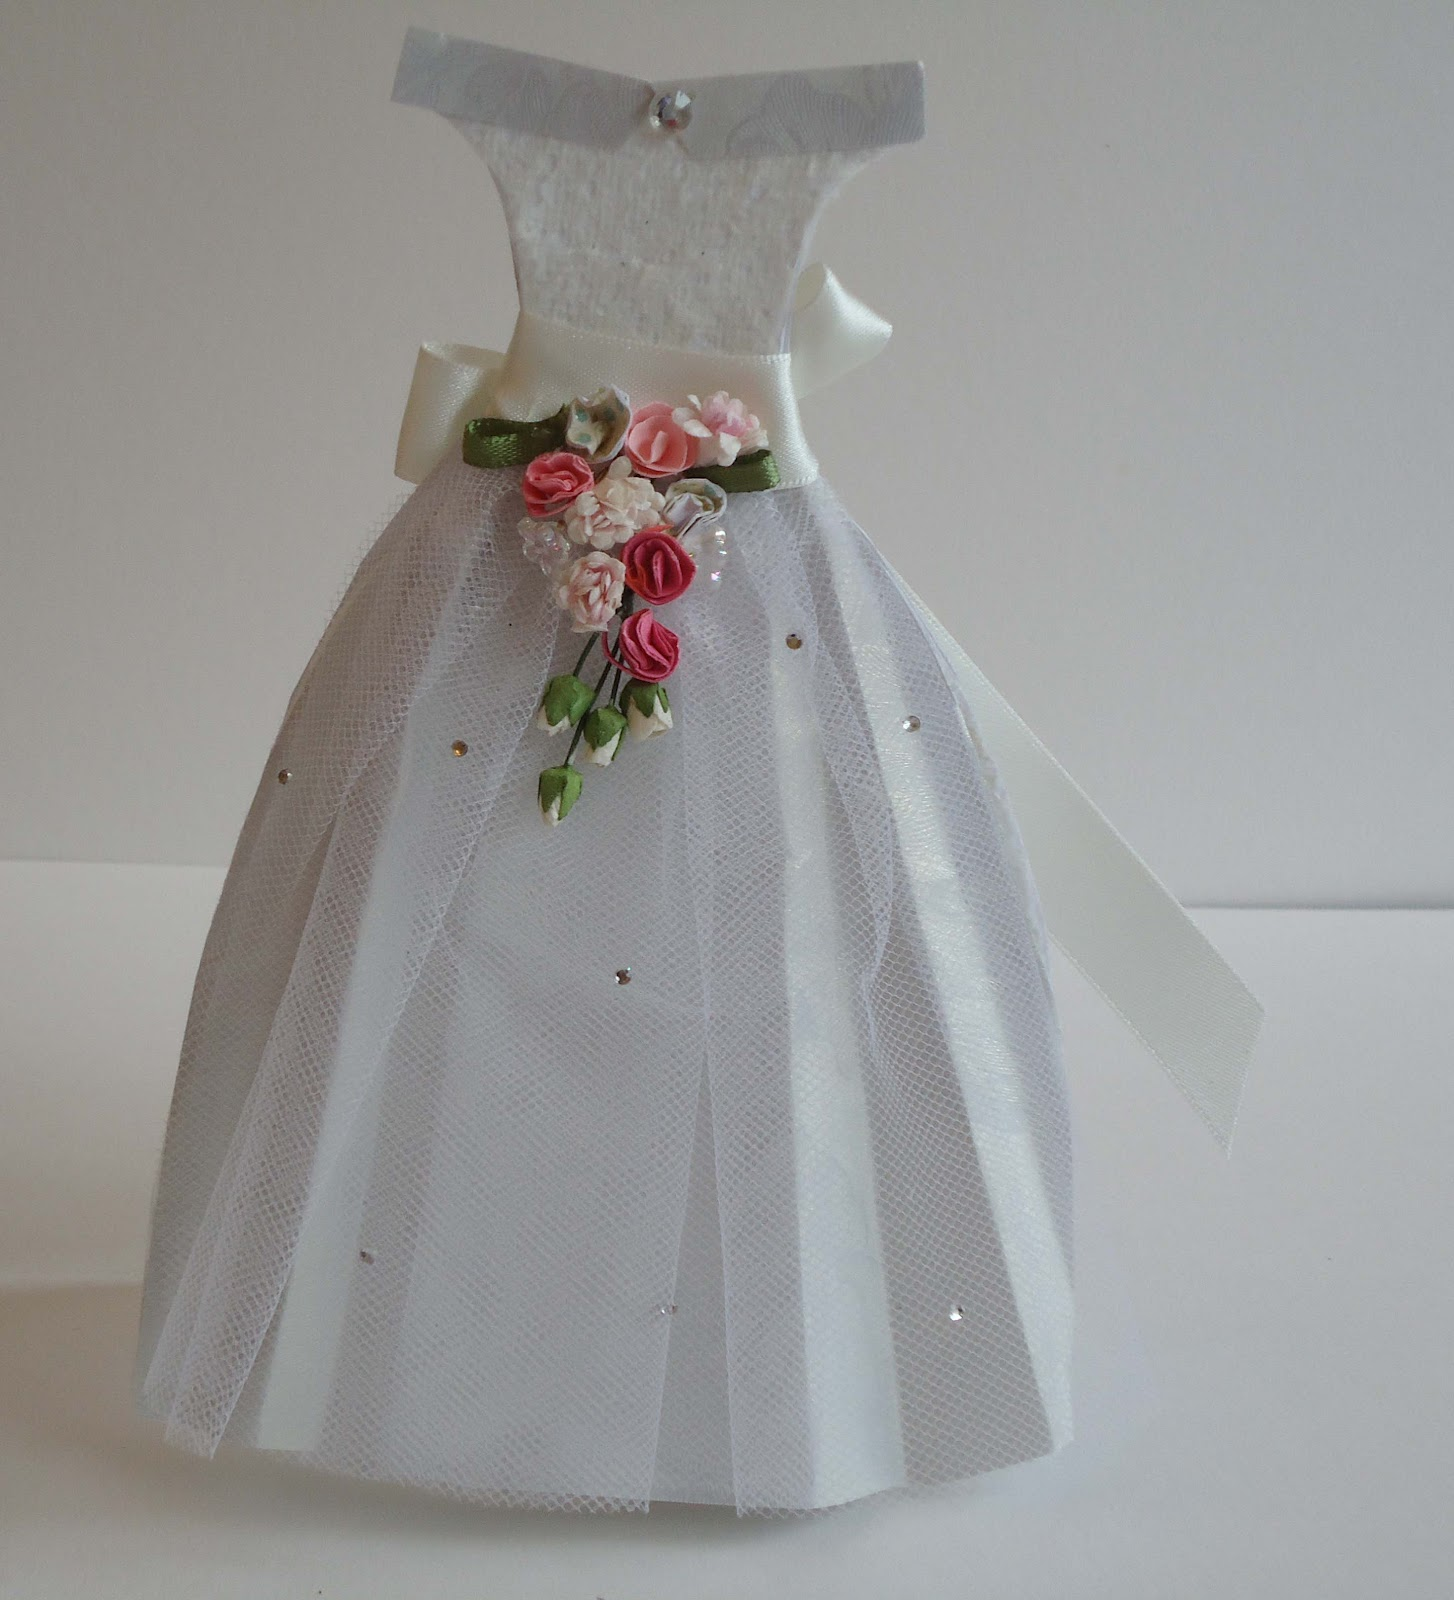 http://3.bp.blogspot.com/-xjA5CszG_UQ/T5UO6IRjAzI/AAAAAAAAAJE/vFgw446GavE/s1600/wedding+dress+card.jpg